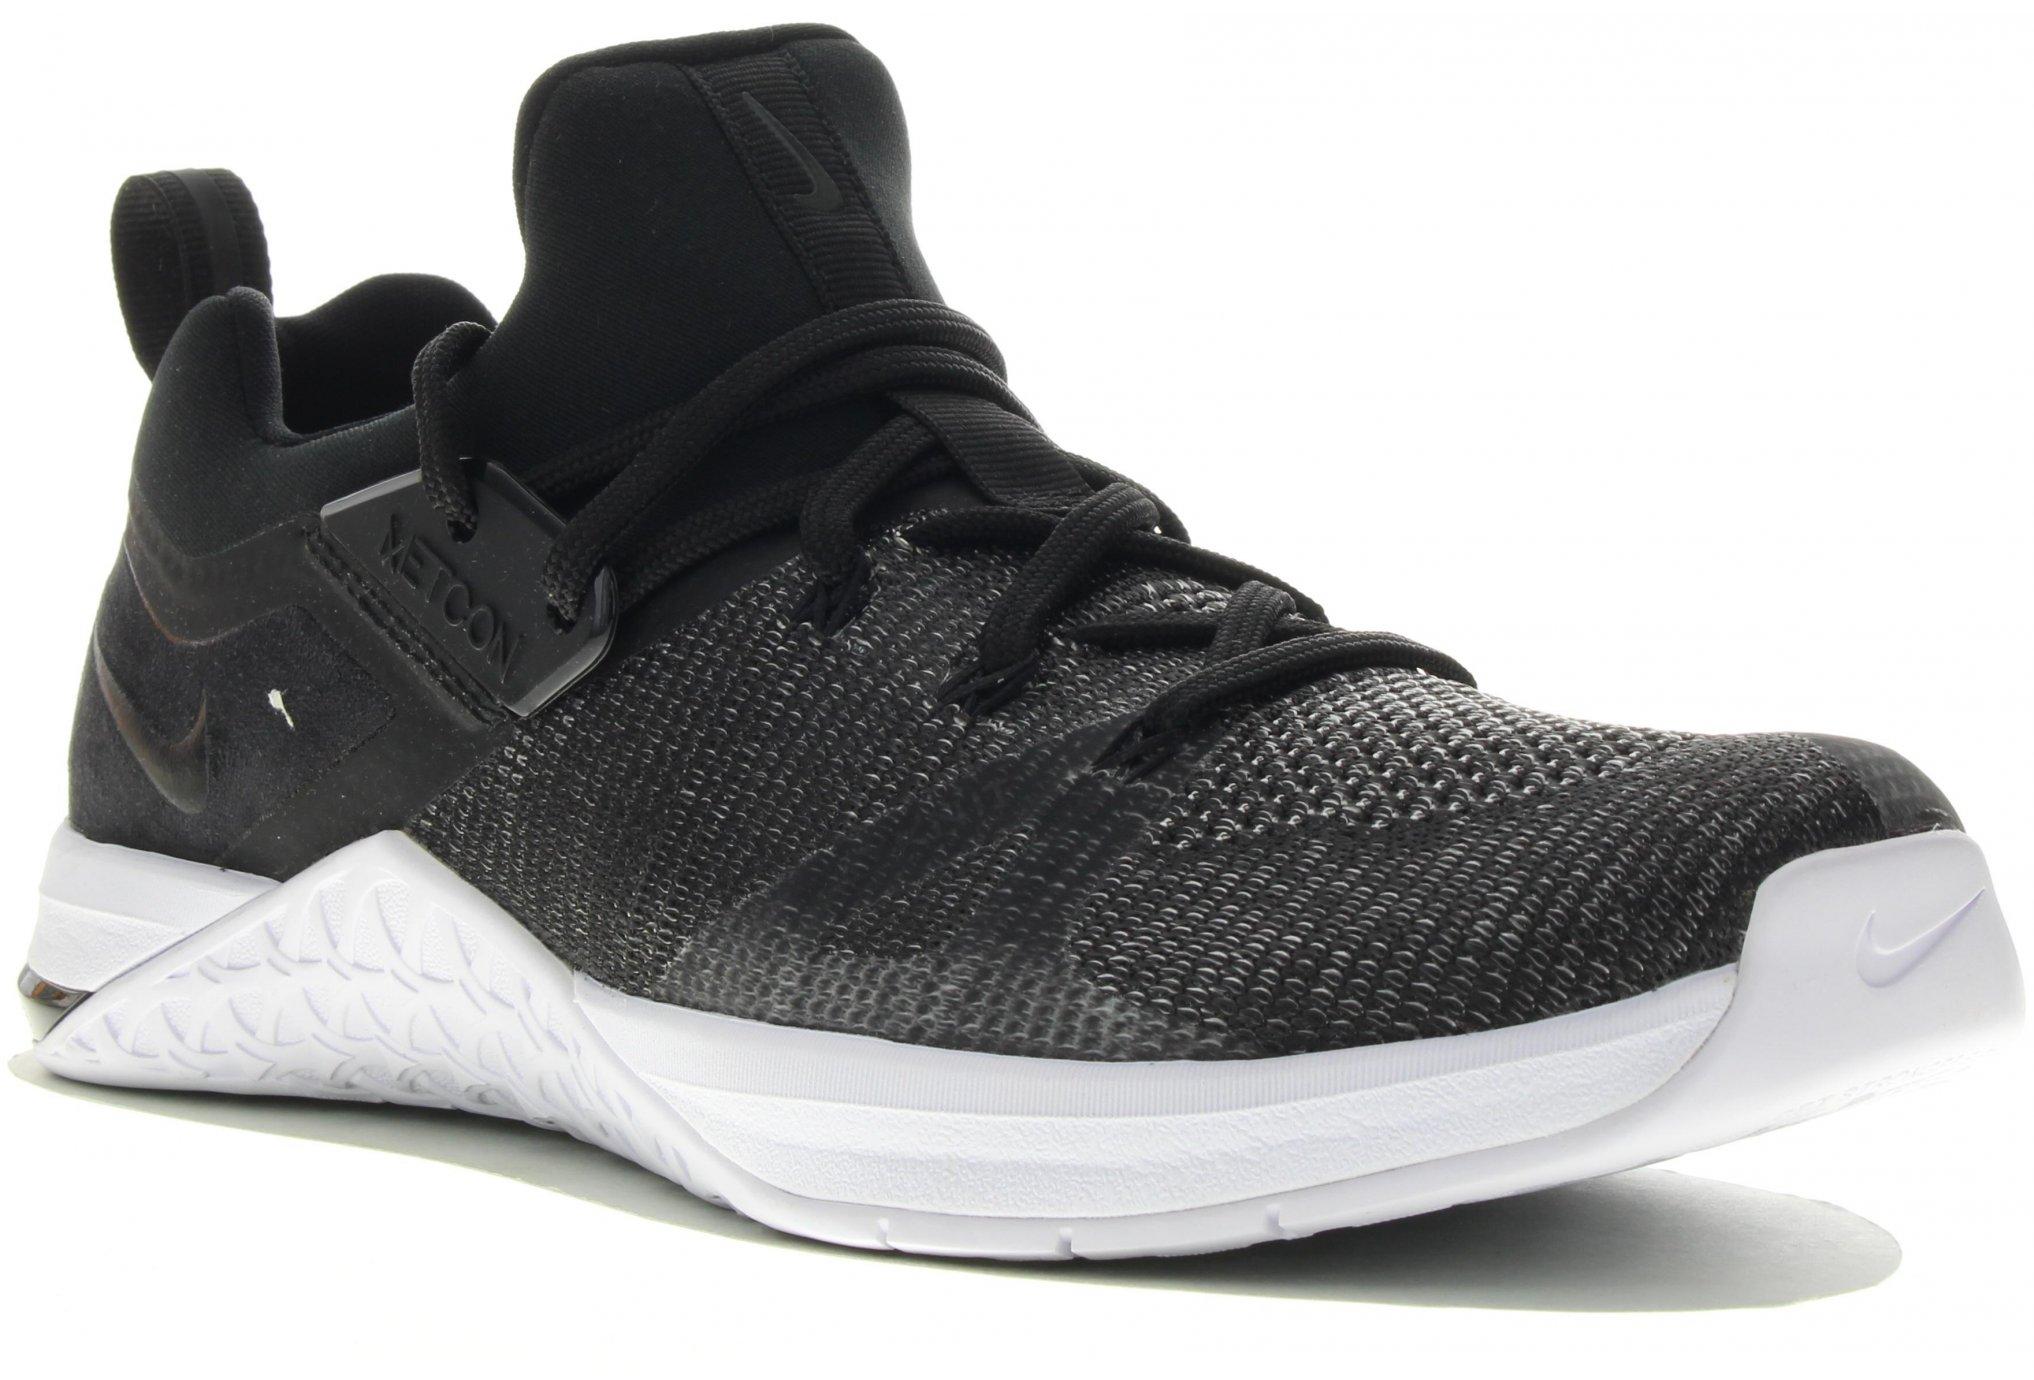 Nike Metcon Flyknit 3 W Chaussures running femme